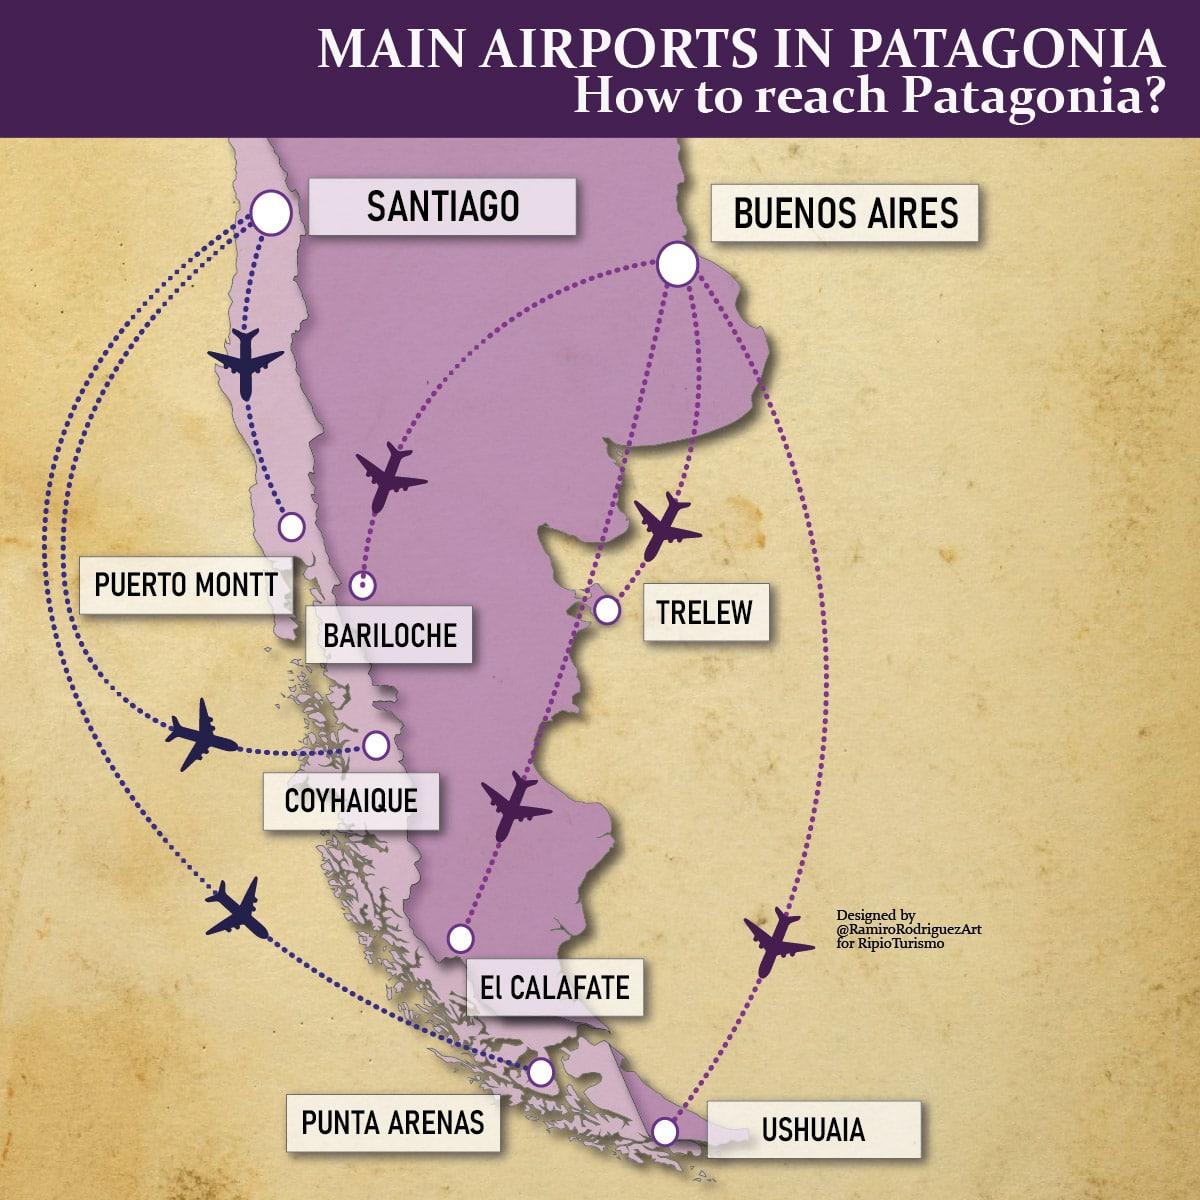 Patagonia Map: Main airports in Patagonia. How to reach Patagonia?